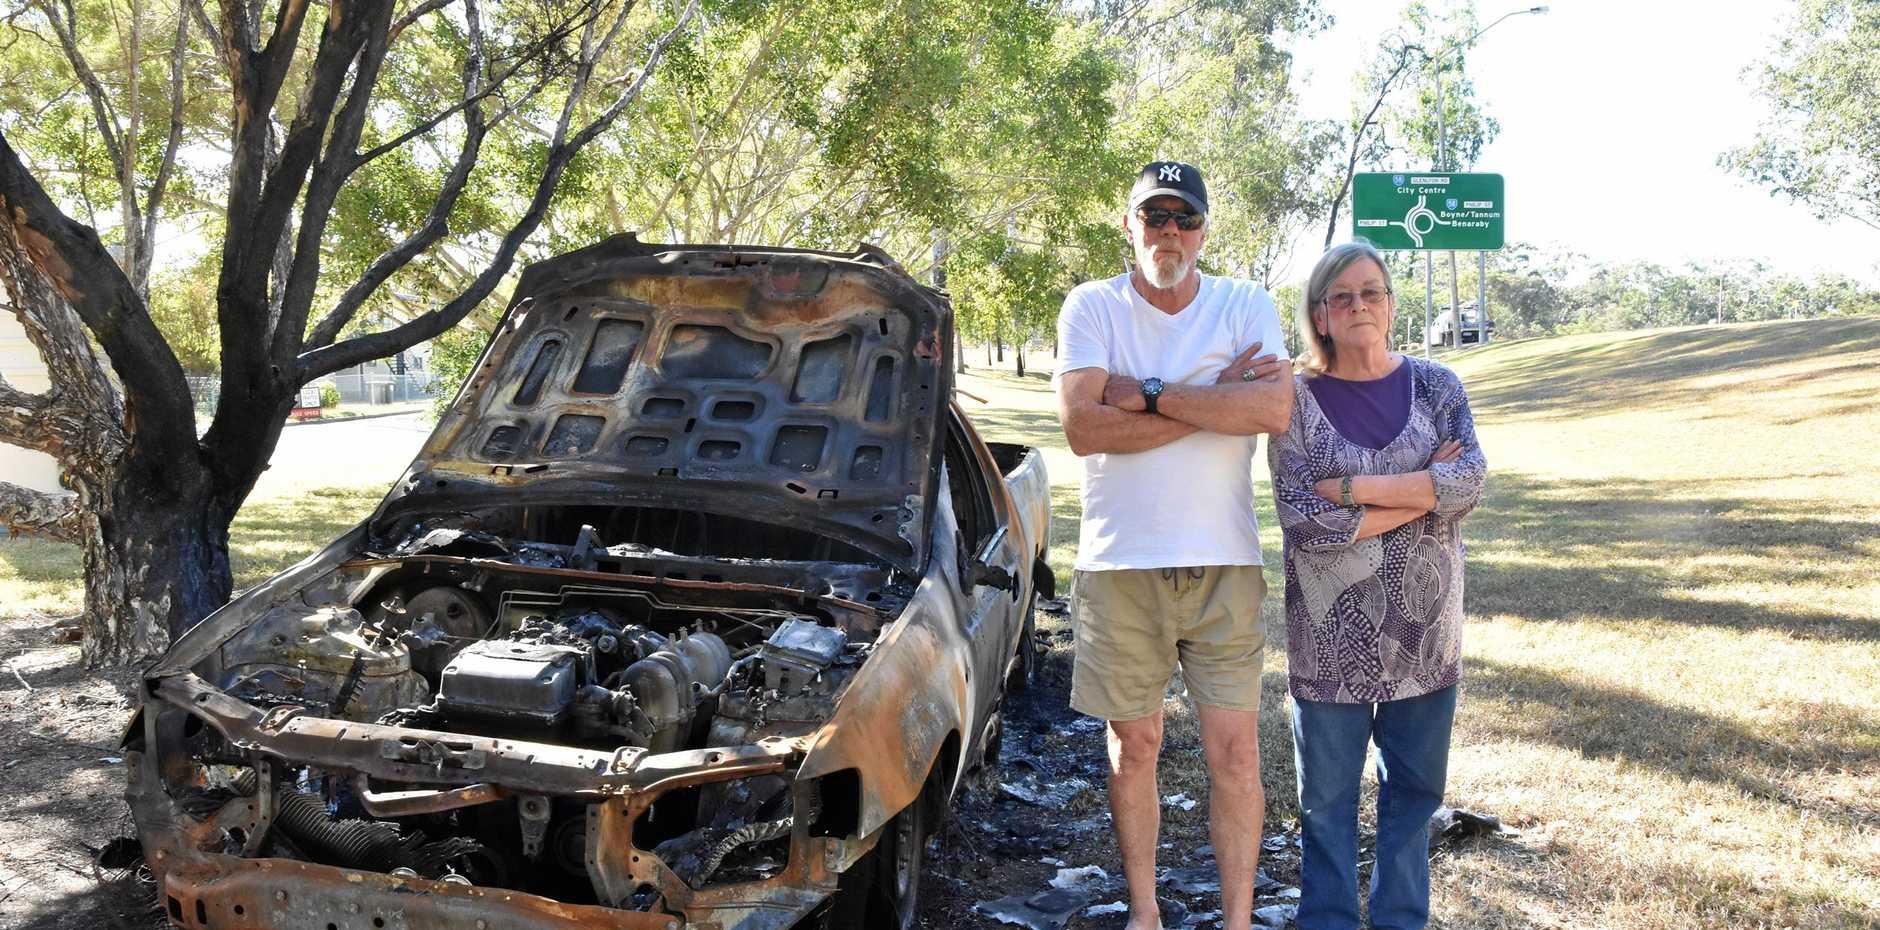 DANGER: Murray, Kaye Cornwell next to the vehicle.